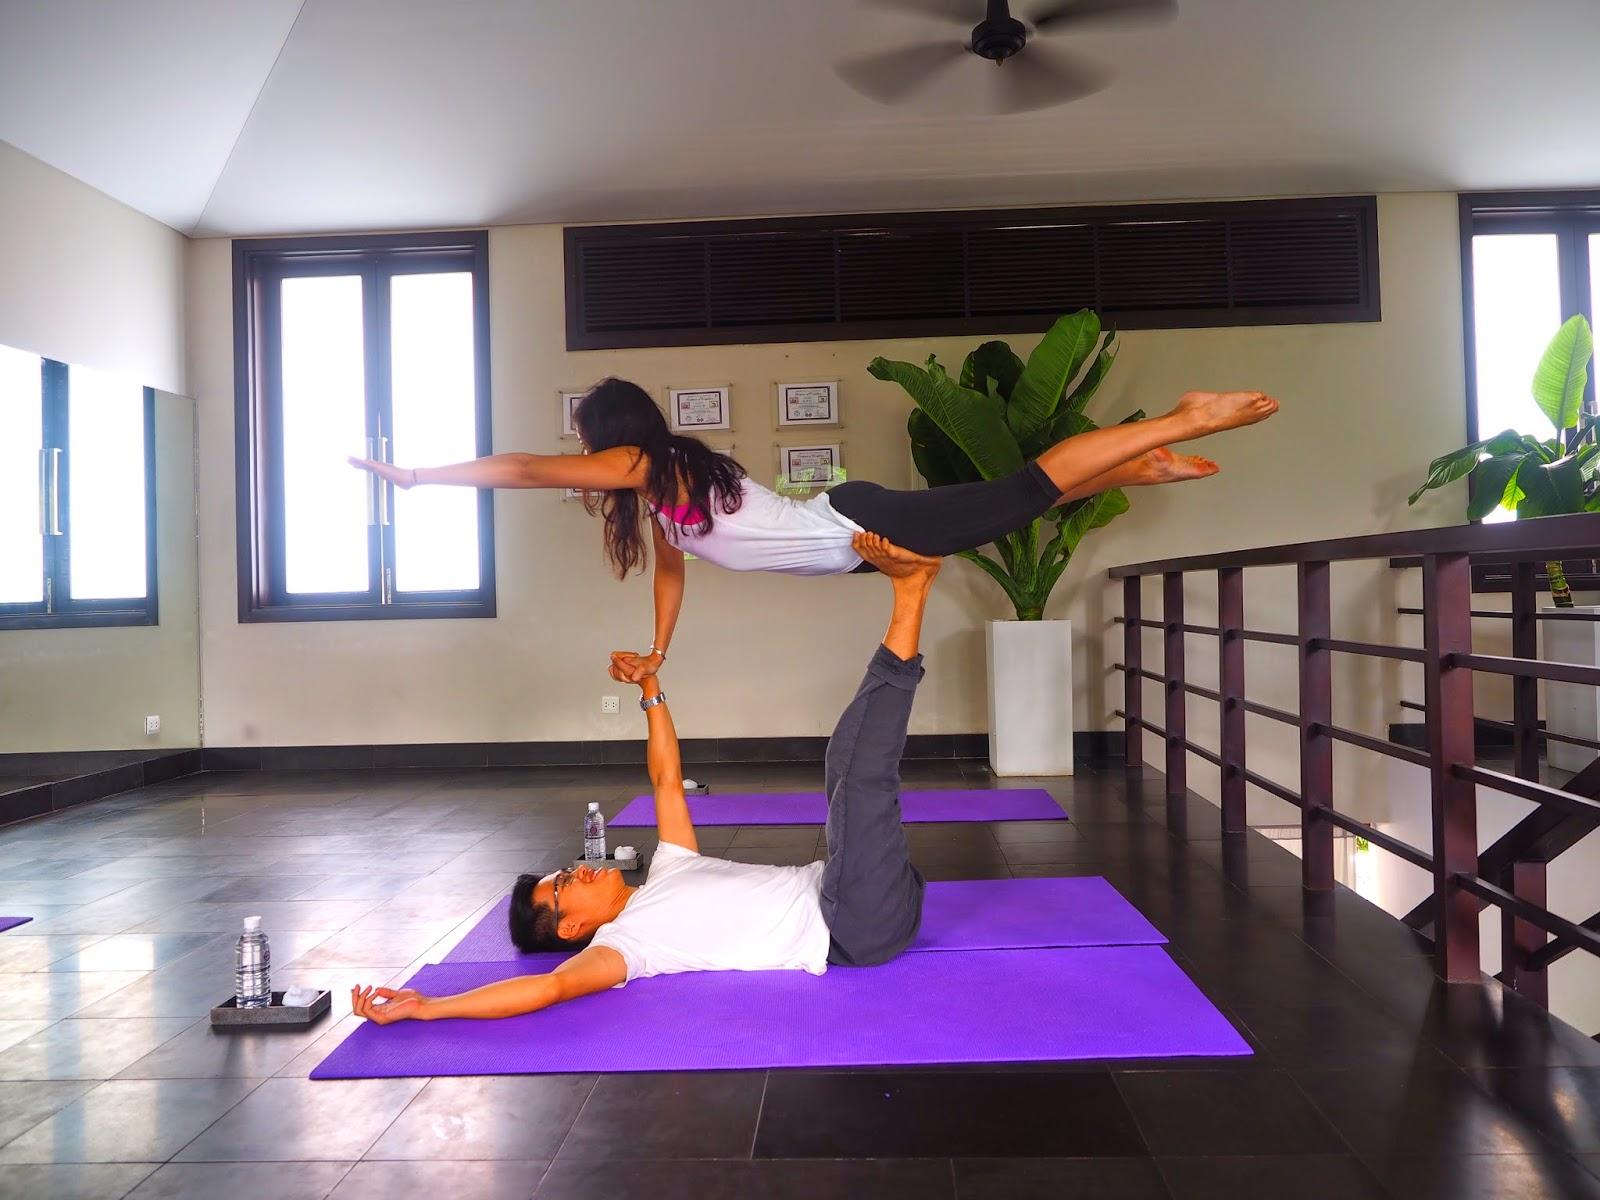 Acro yoga Fusion Maia Da Nang Vietnam